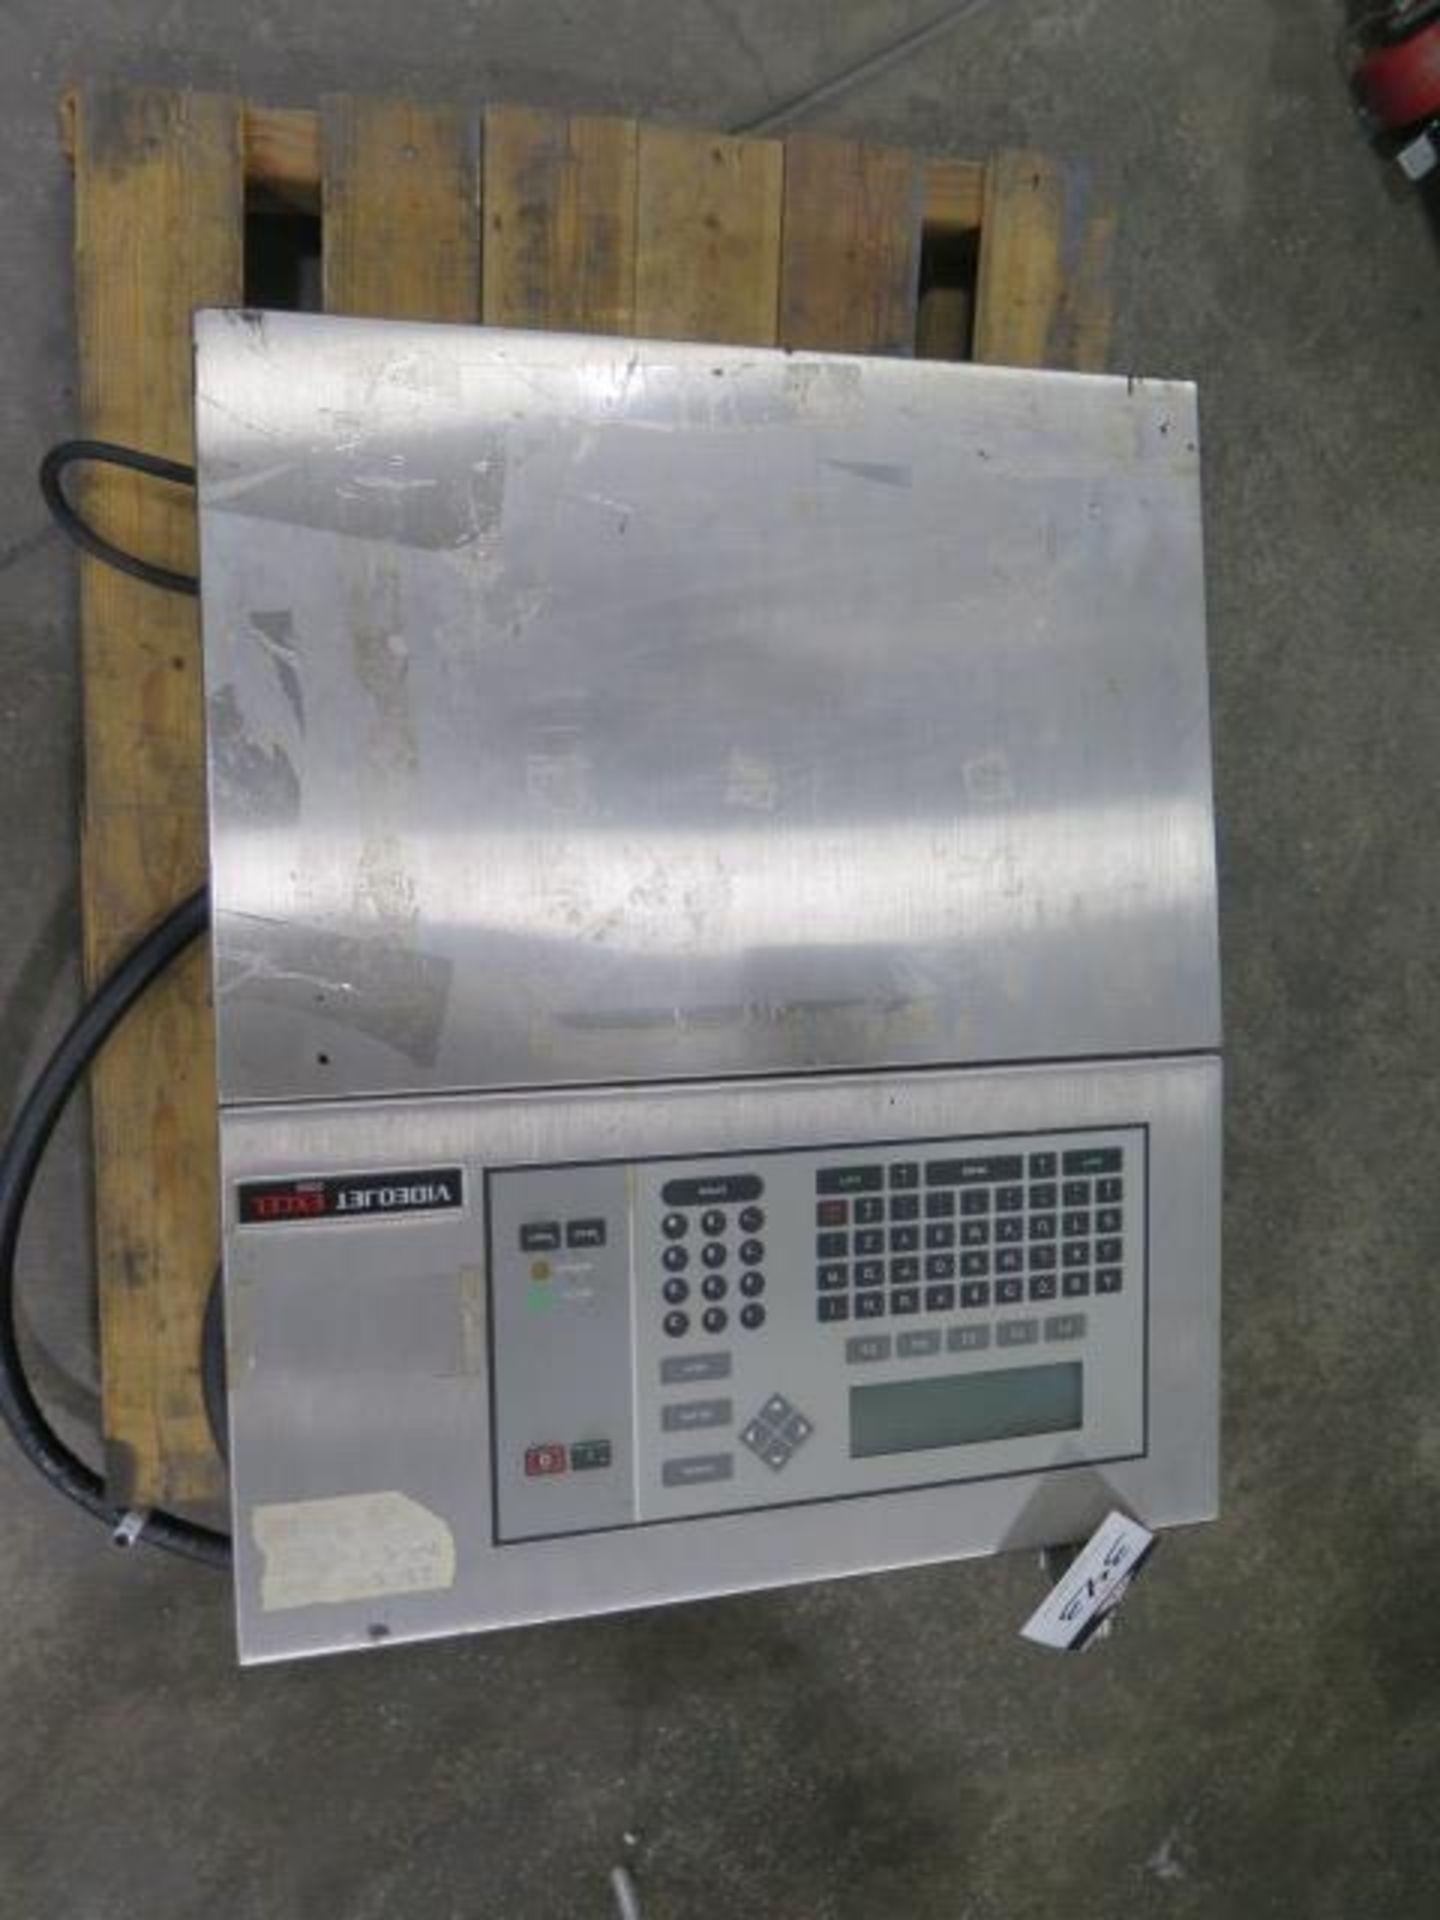 VideoJet EXCEL-2000 Ink Jet Printing System (SOLD AS-IS - NO WARRANTY)